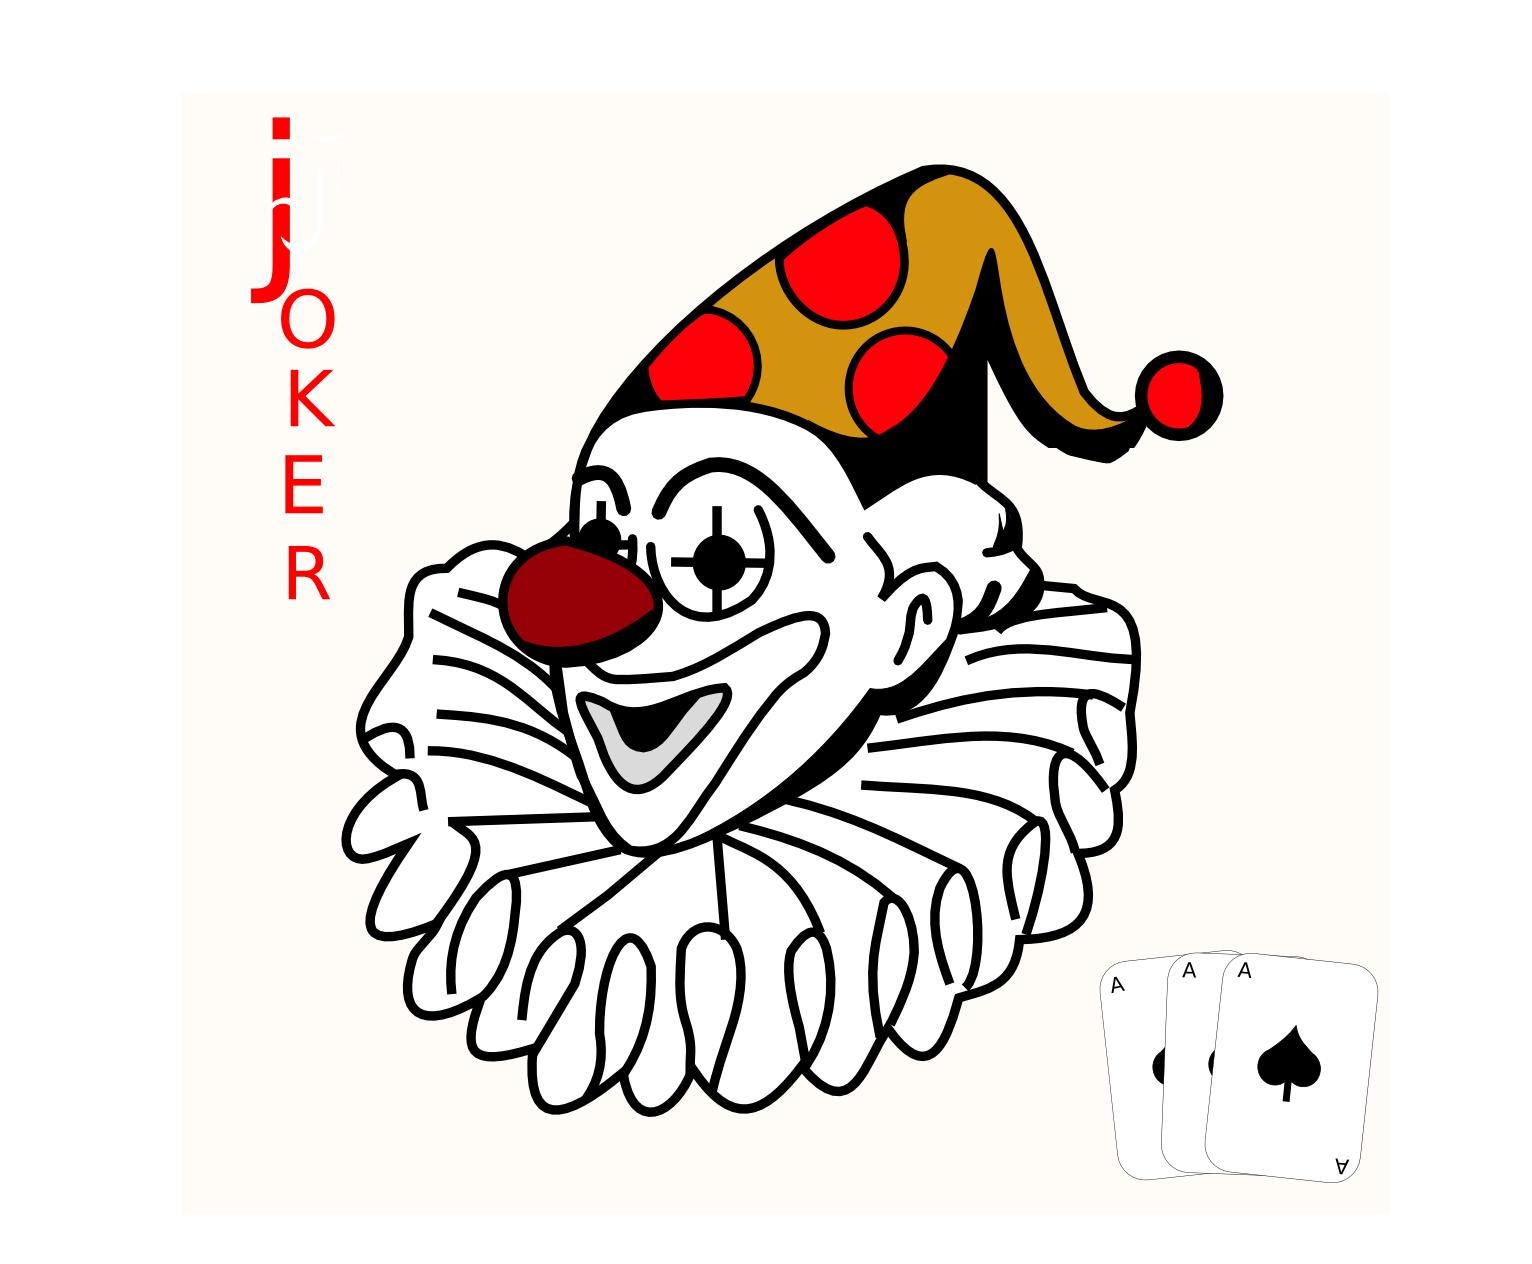 Joker face - /recreation/games/card_deck/cards_symbols/Joker_face.png.html